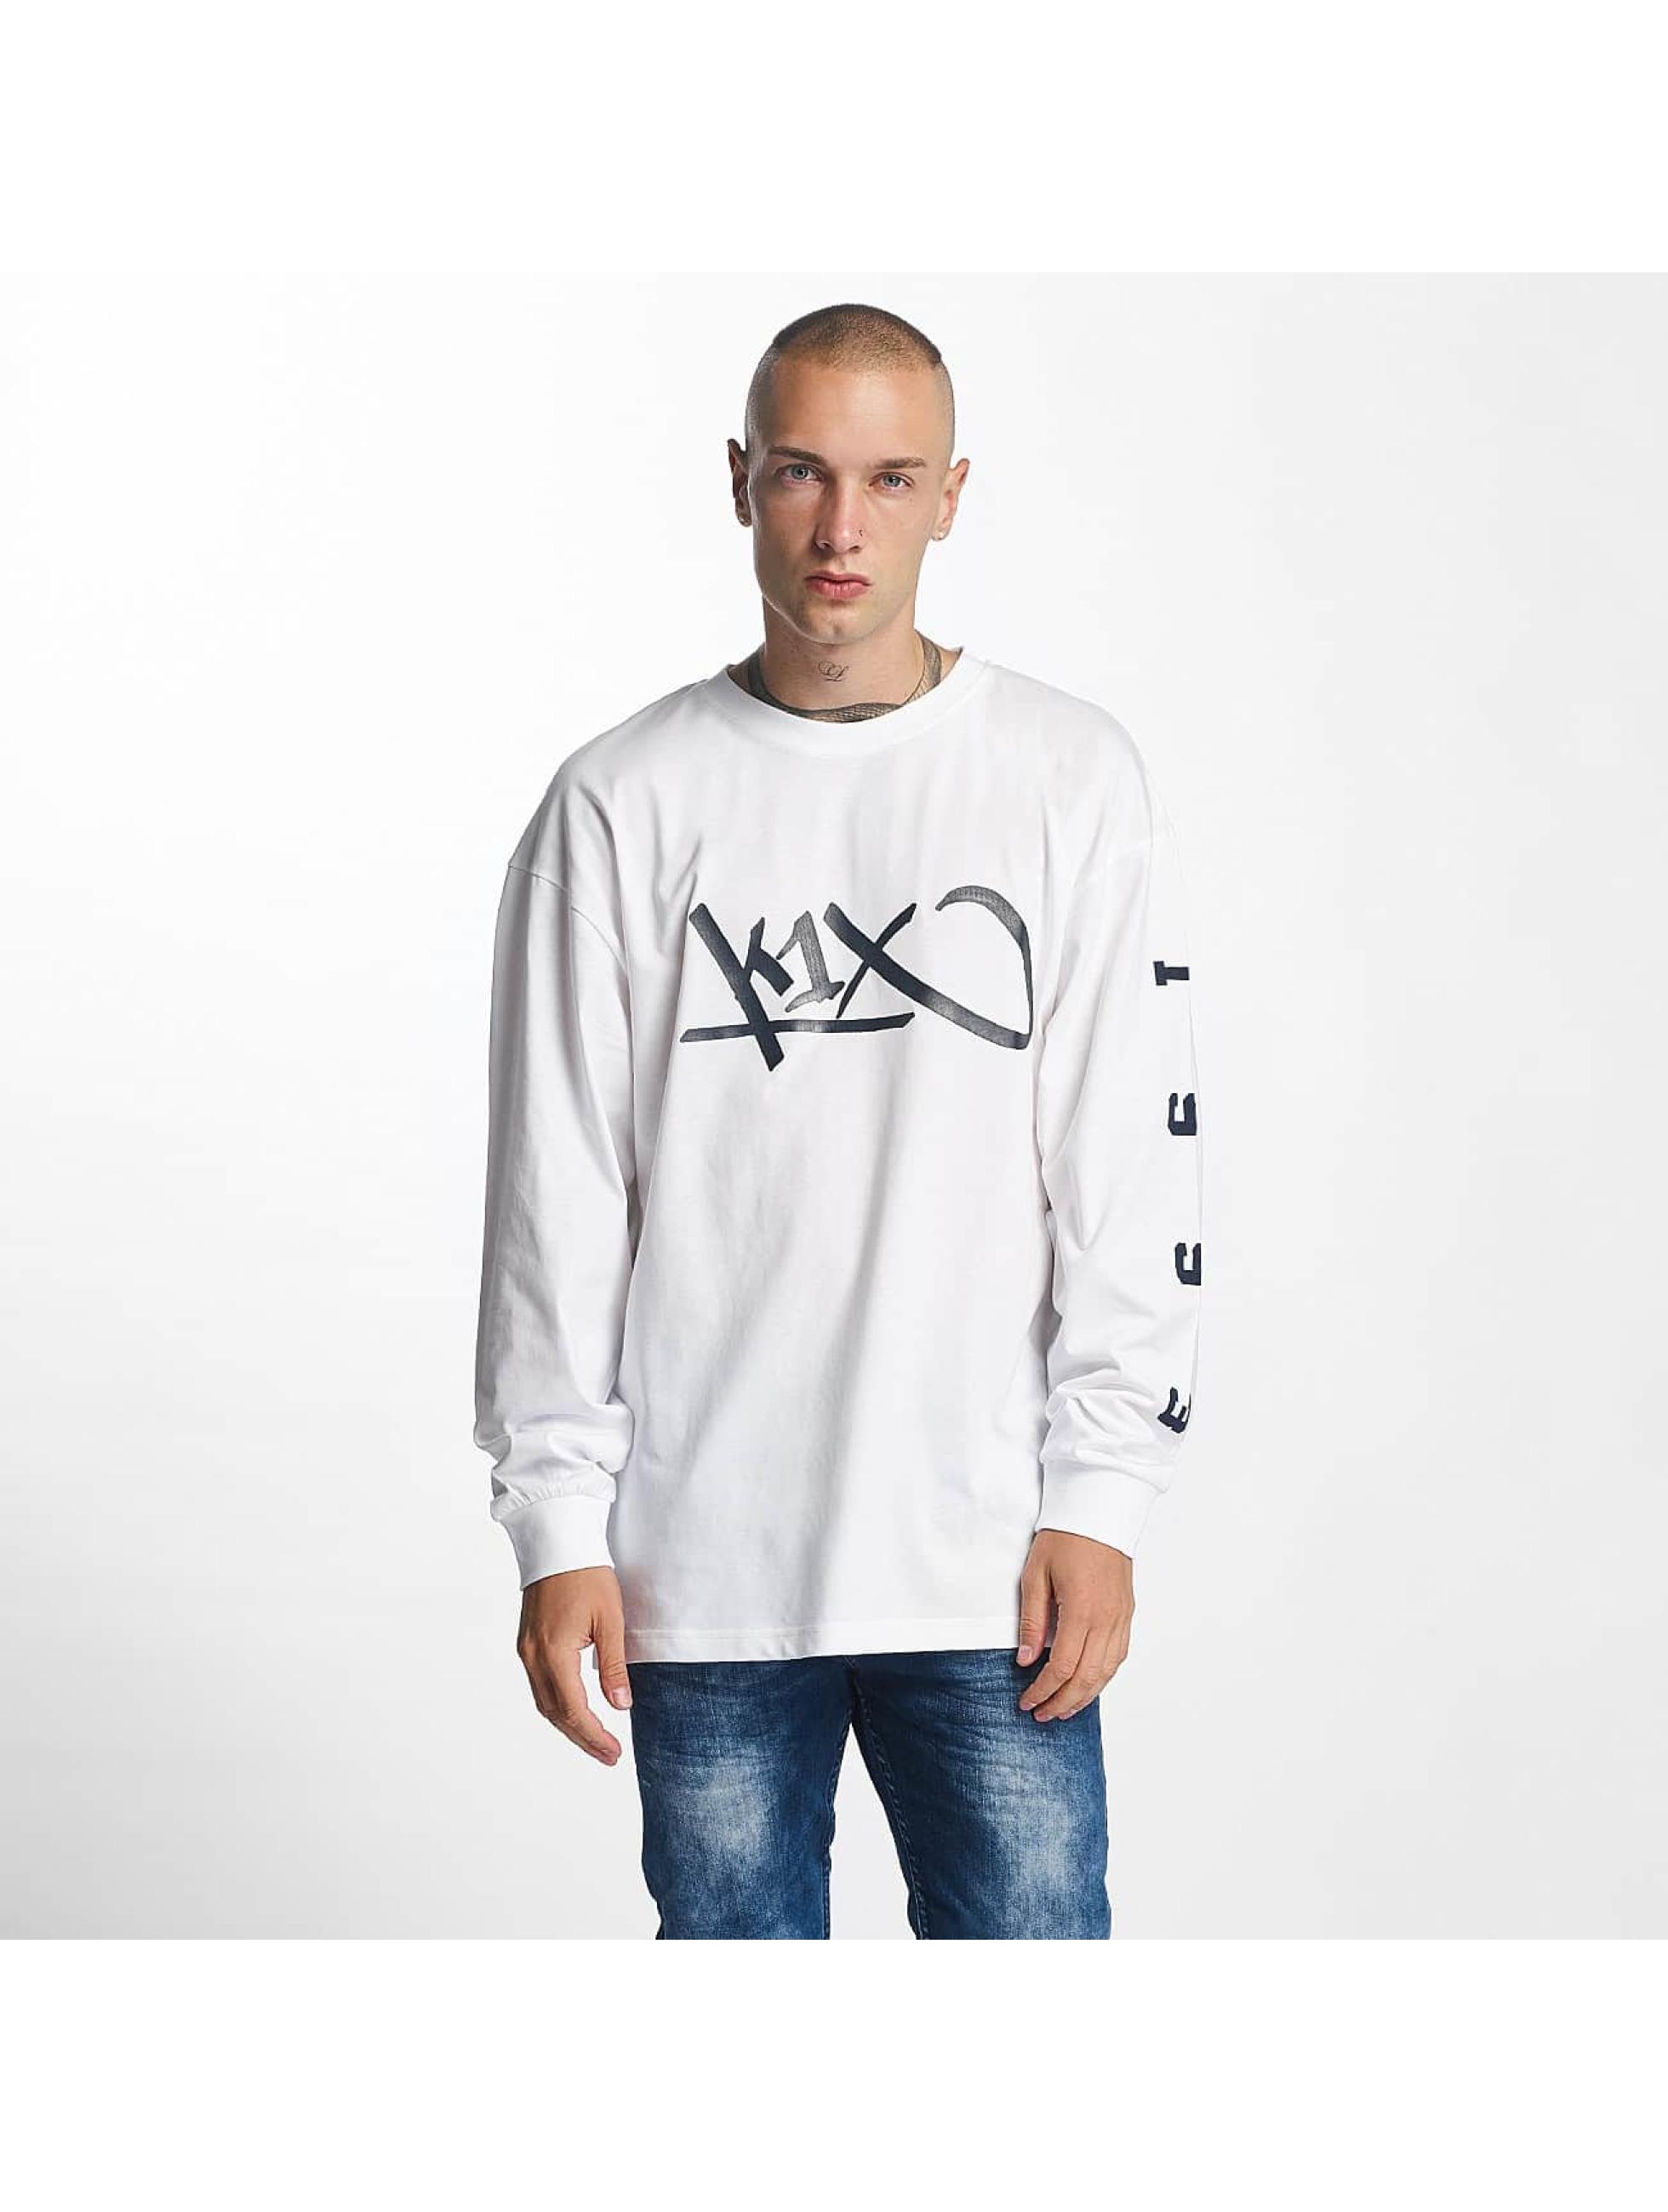 K1X Longsleeve Ivery Sports weiß